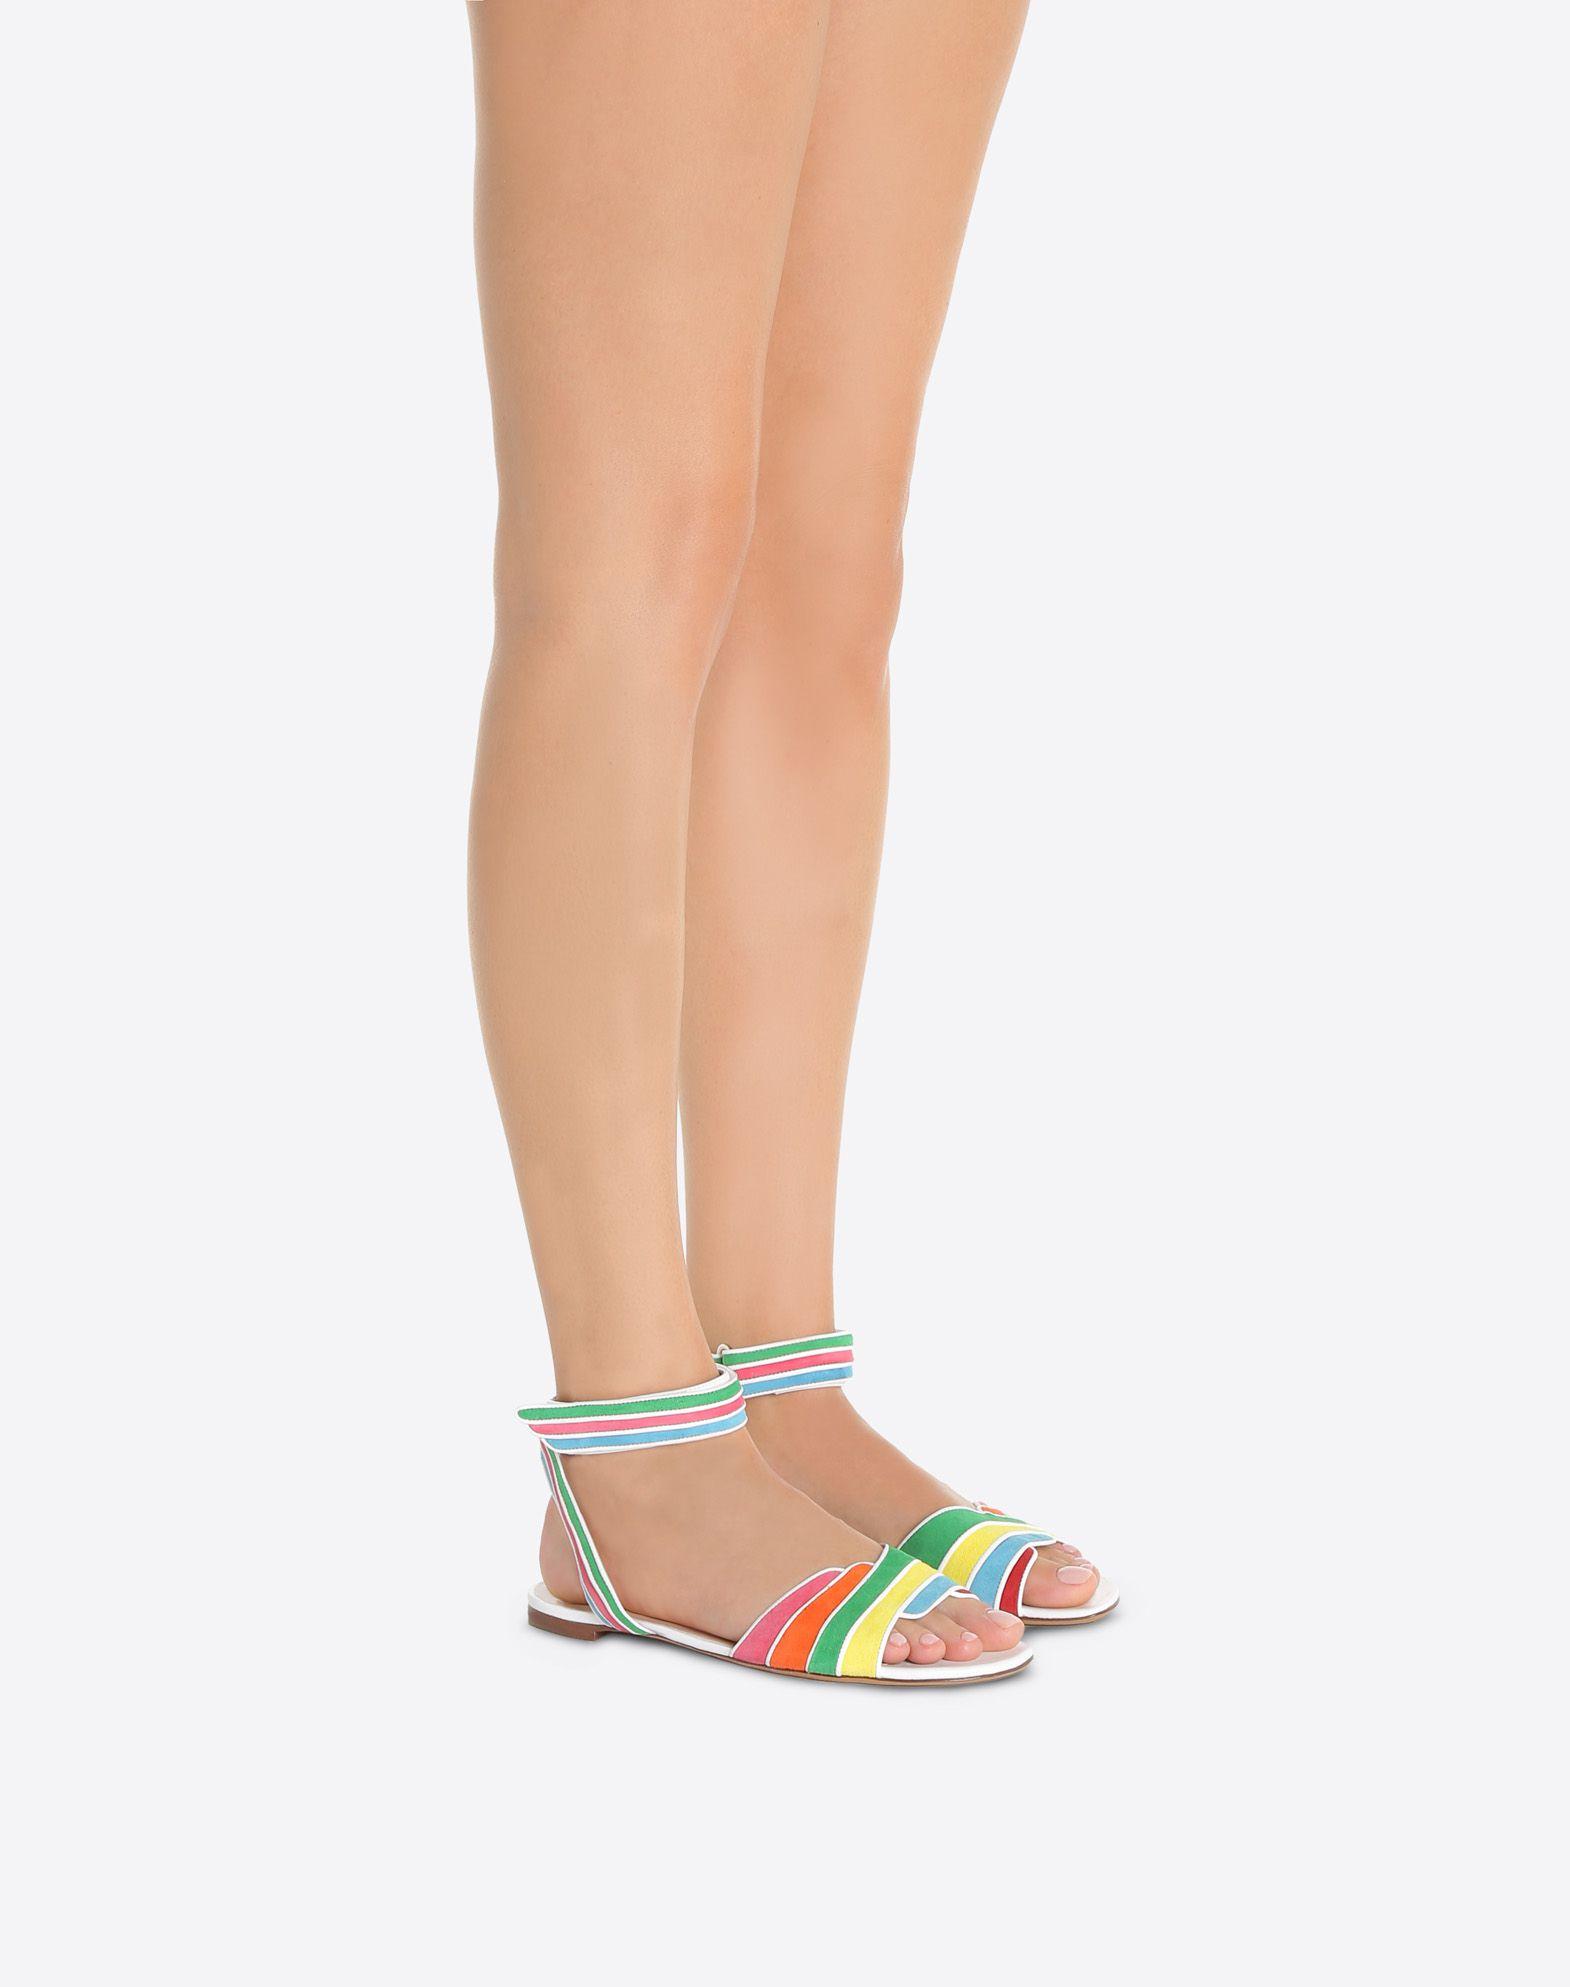 VALENTINO GARAVANI Sandalias multicolores FLAT SANDALS D a